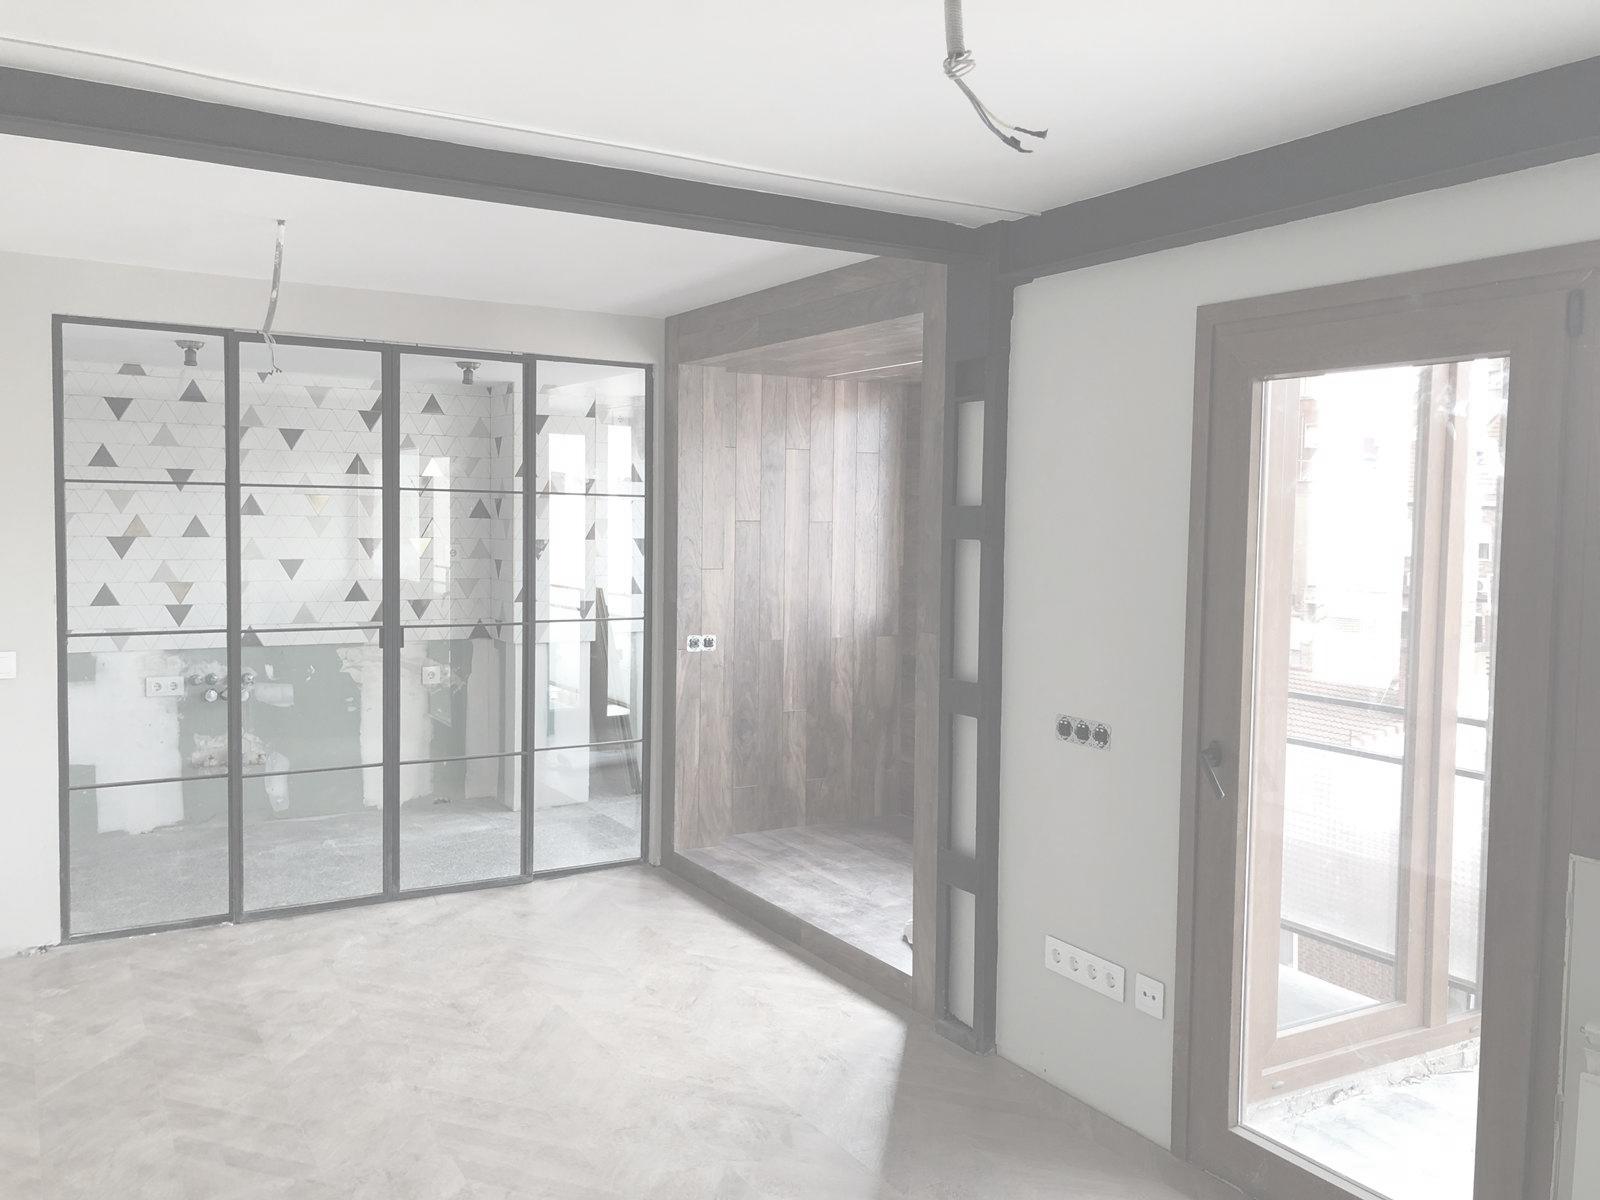 emmme studio slow design interiorismo integral Ana y Eduardo en obras BW.jpg